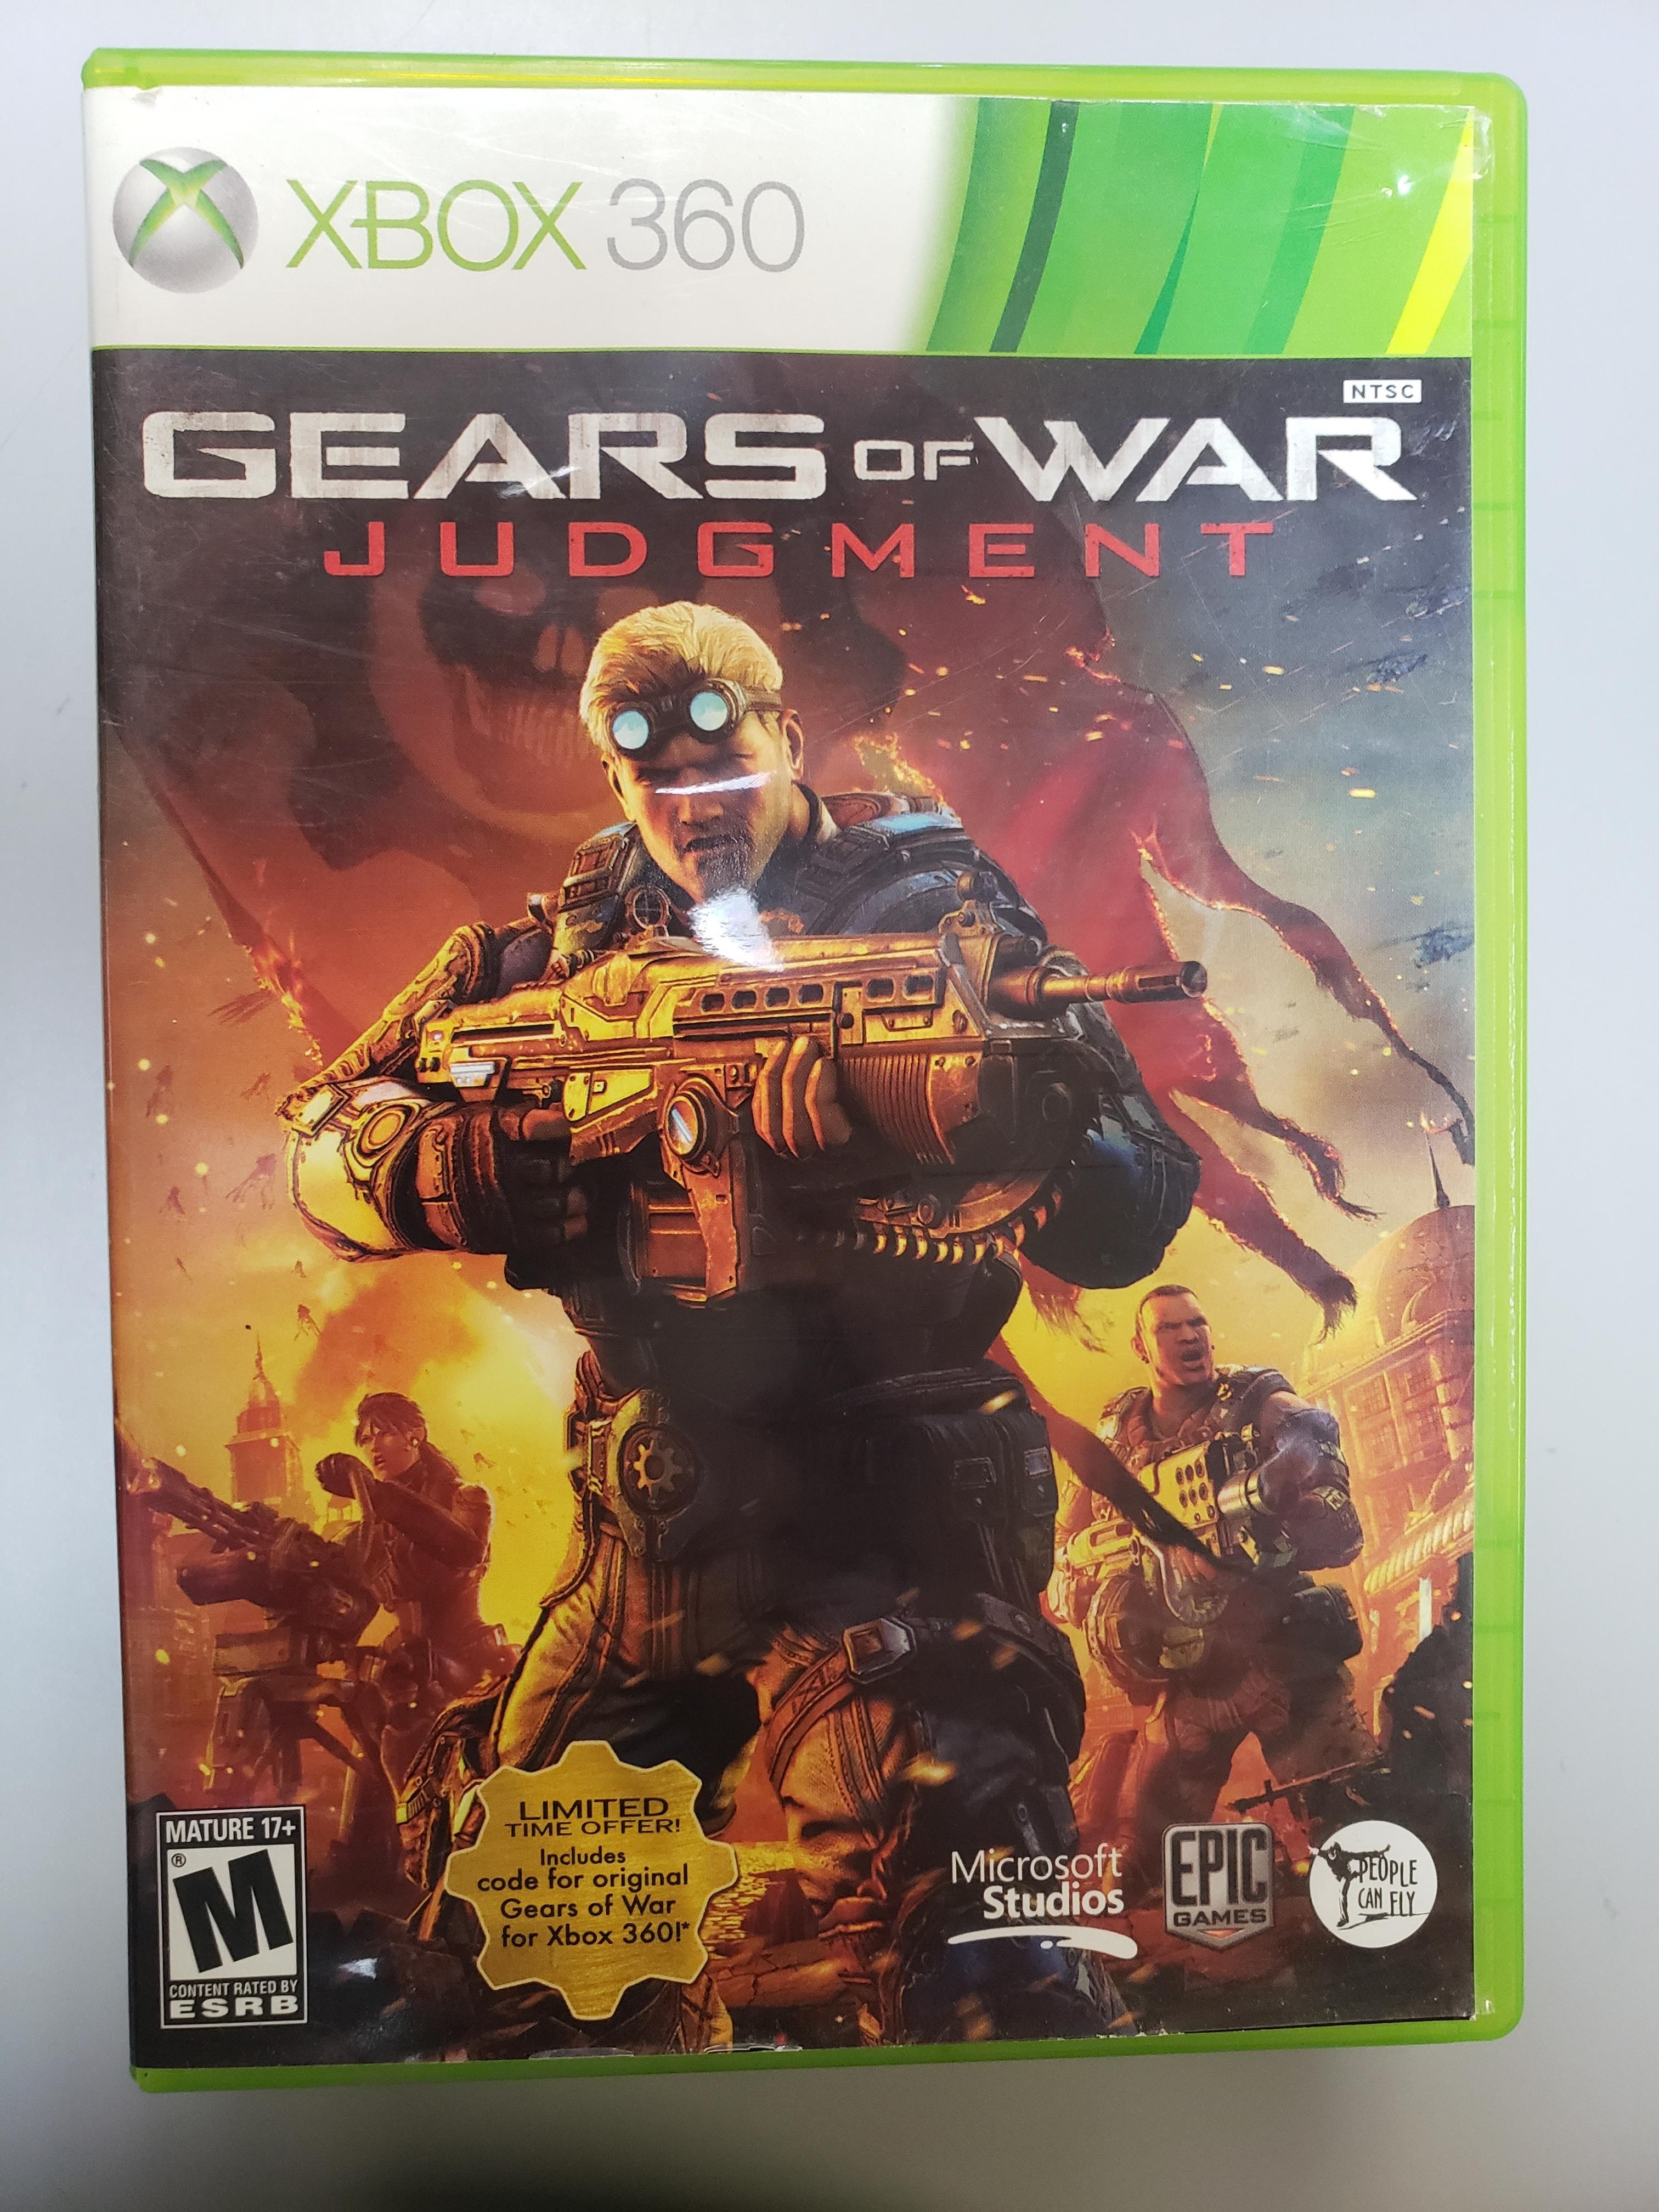 GEARS OF WAR: JUDGEMENT - XBOX 360 GAME